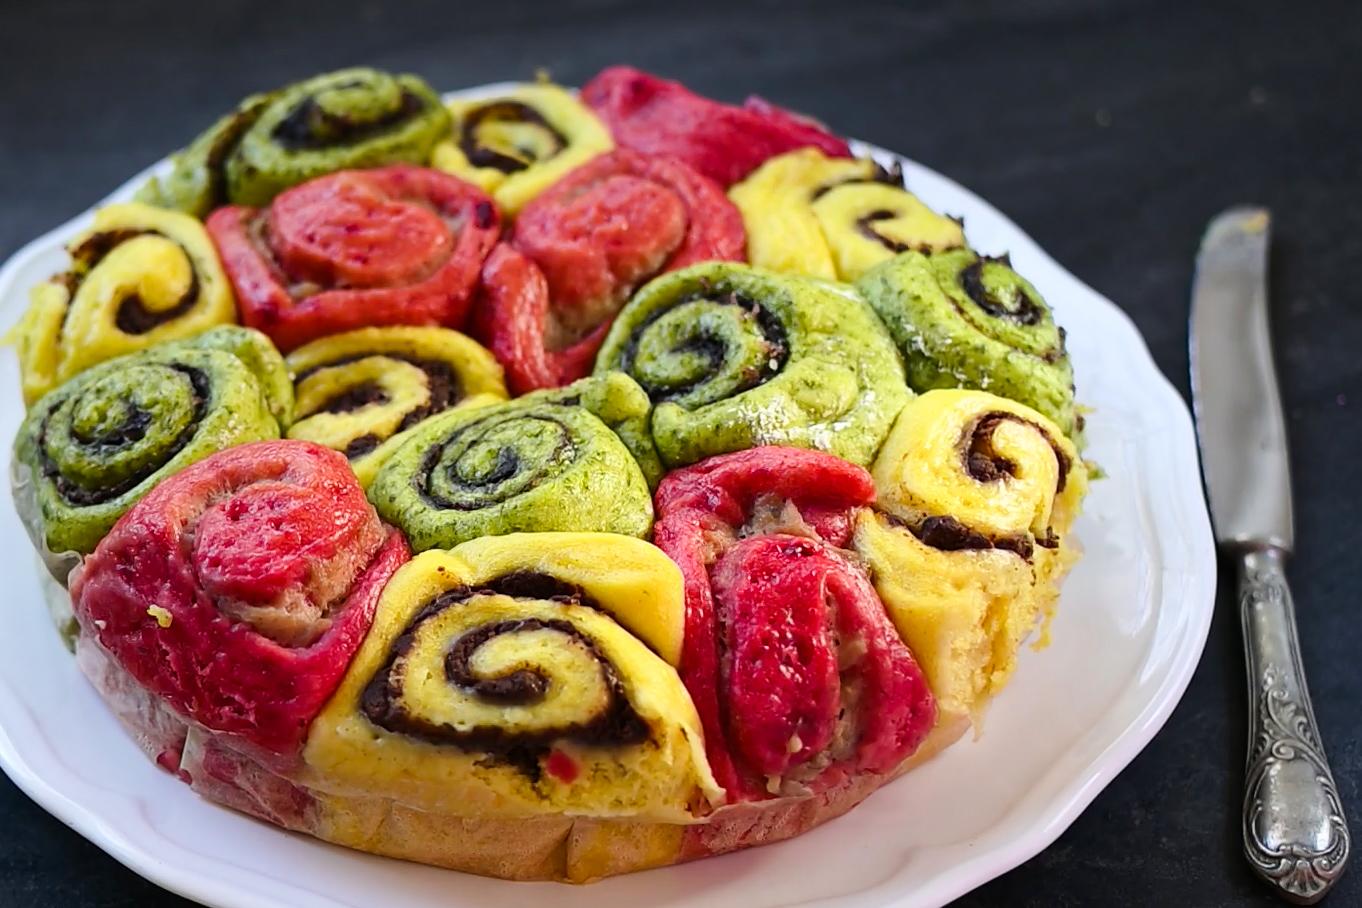 Vegan Steamed Cake (Brioche-like)